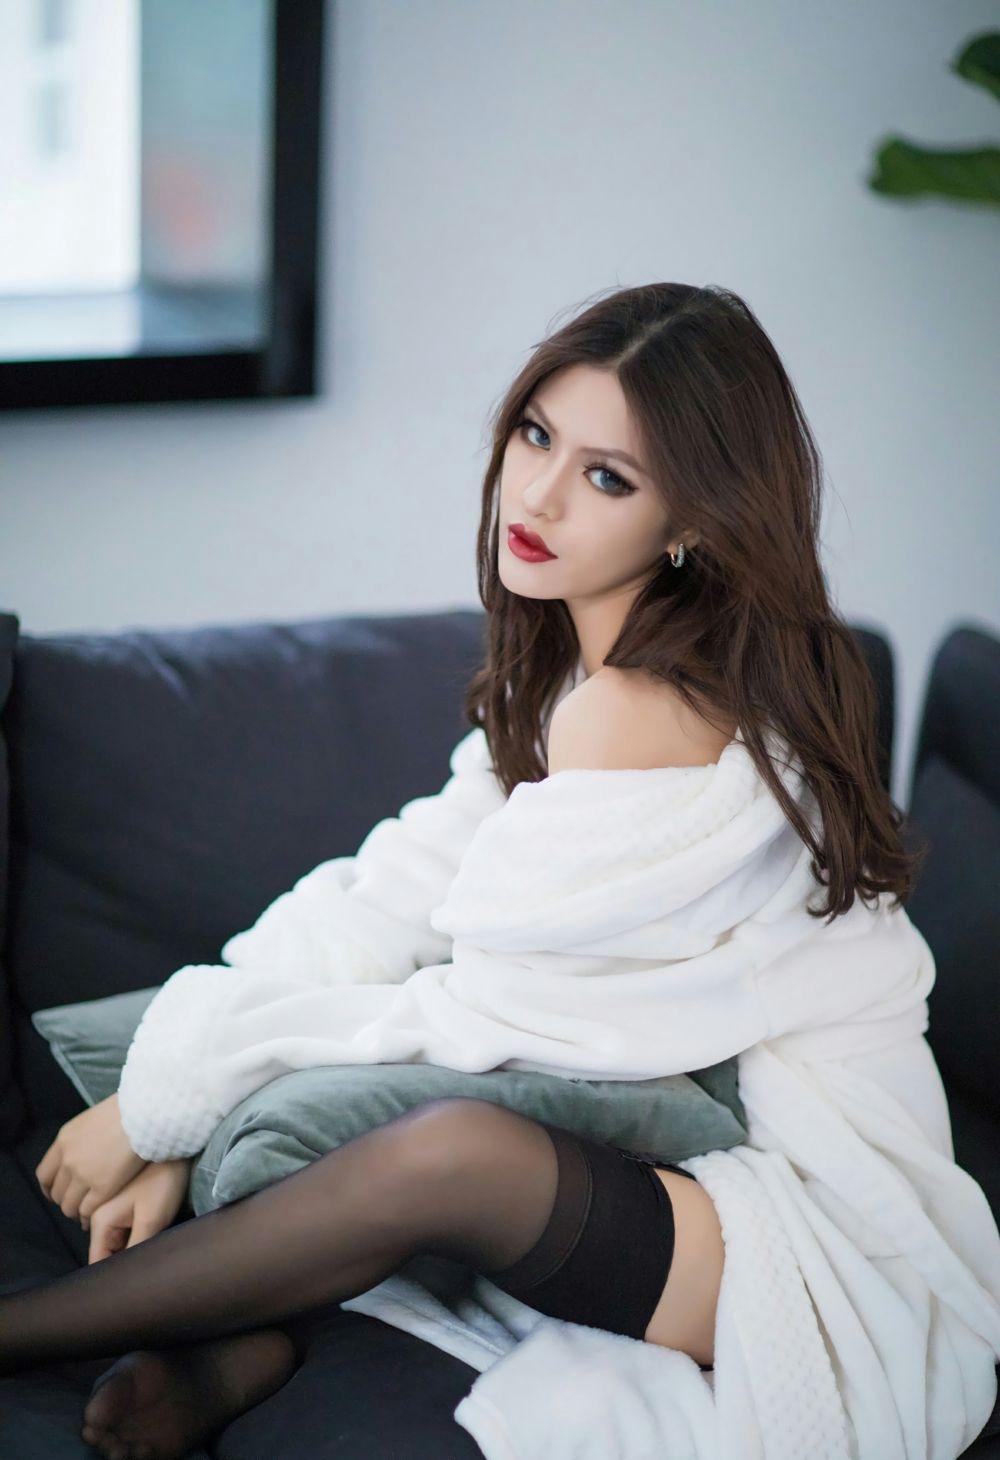 4IPX-062韩国性感美女低胸诱惑写真